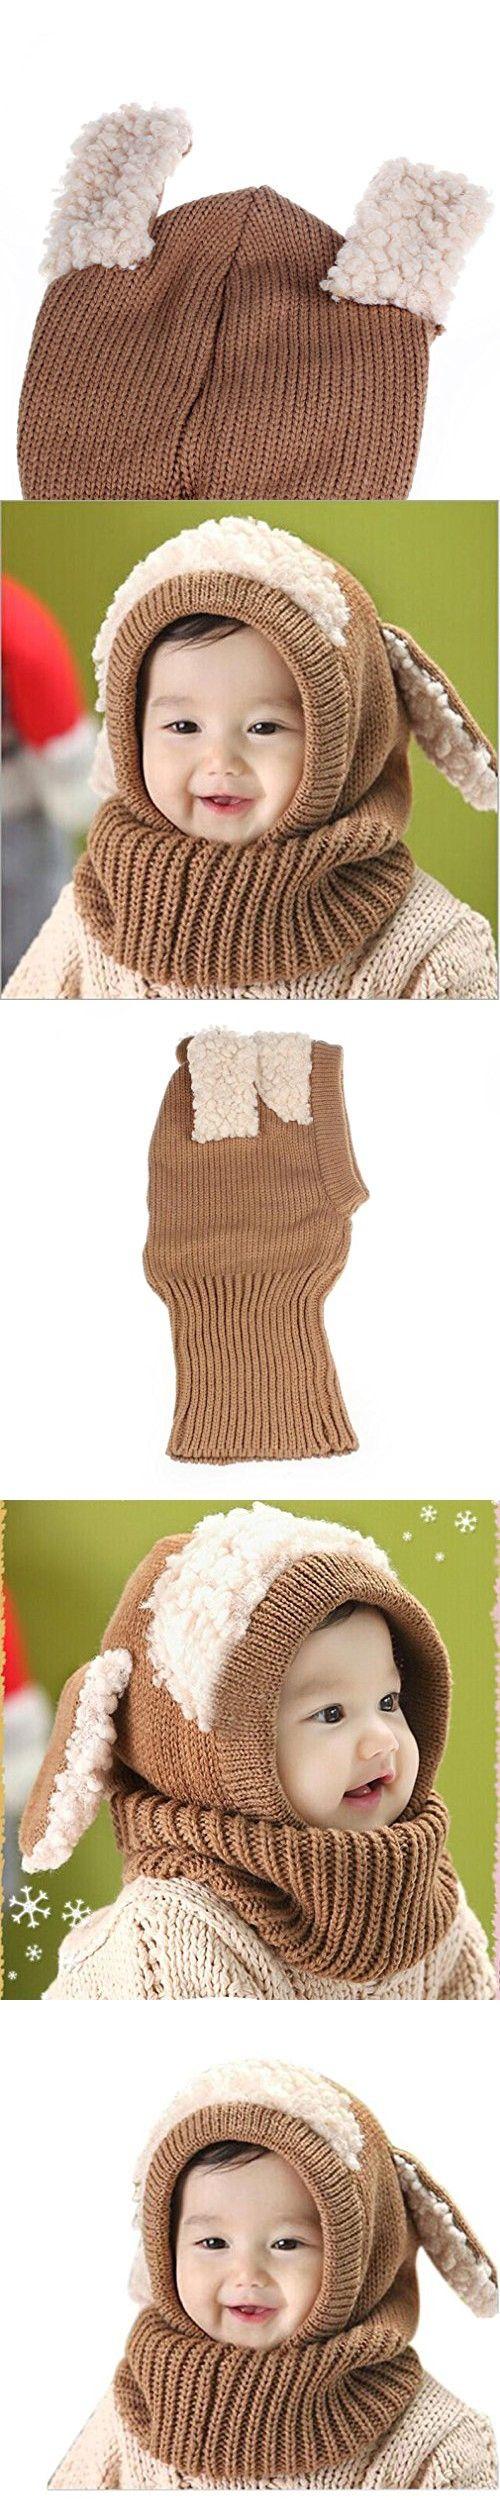 Winter Baby Kids Caps, Misaky Warm Woolen Coif Hood Scarf Hats (Free Size, Khaki)